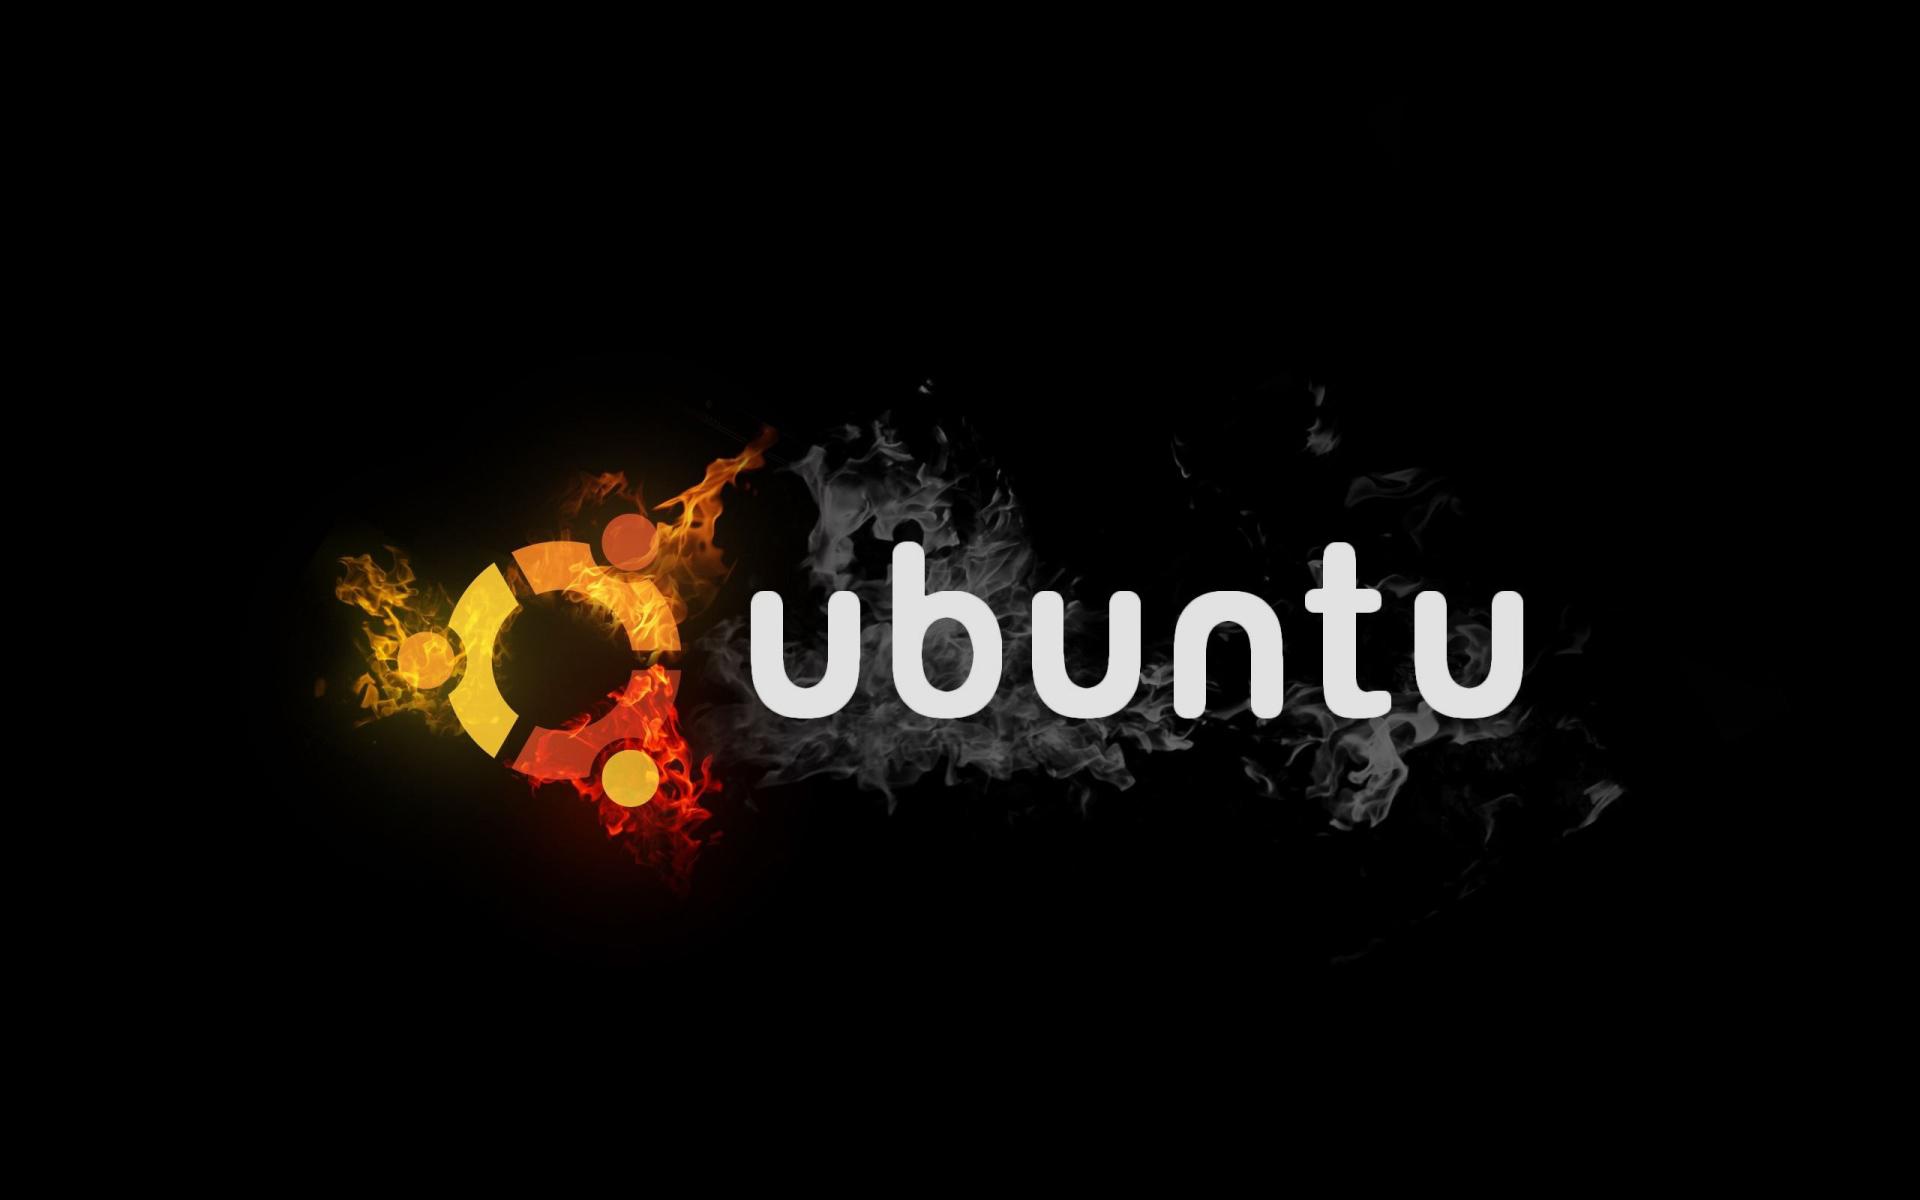 Free Download Ubuntu Backgrounds High Quality Ubuntu Background